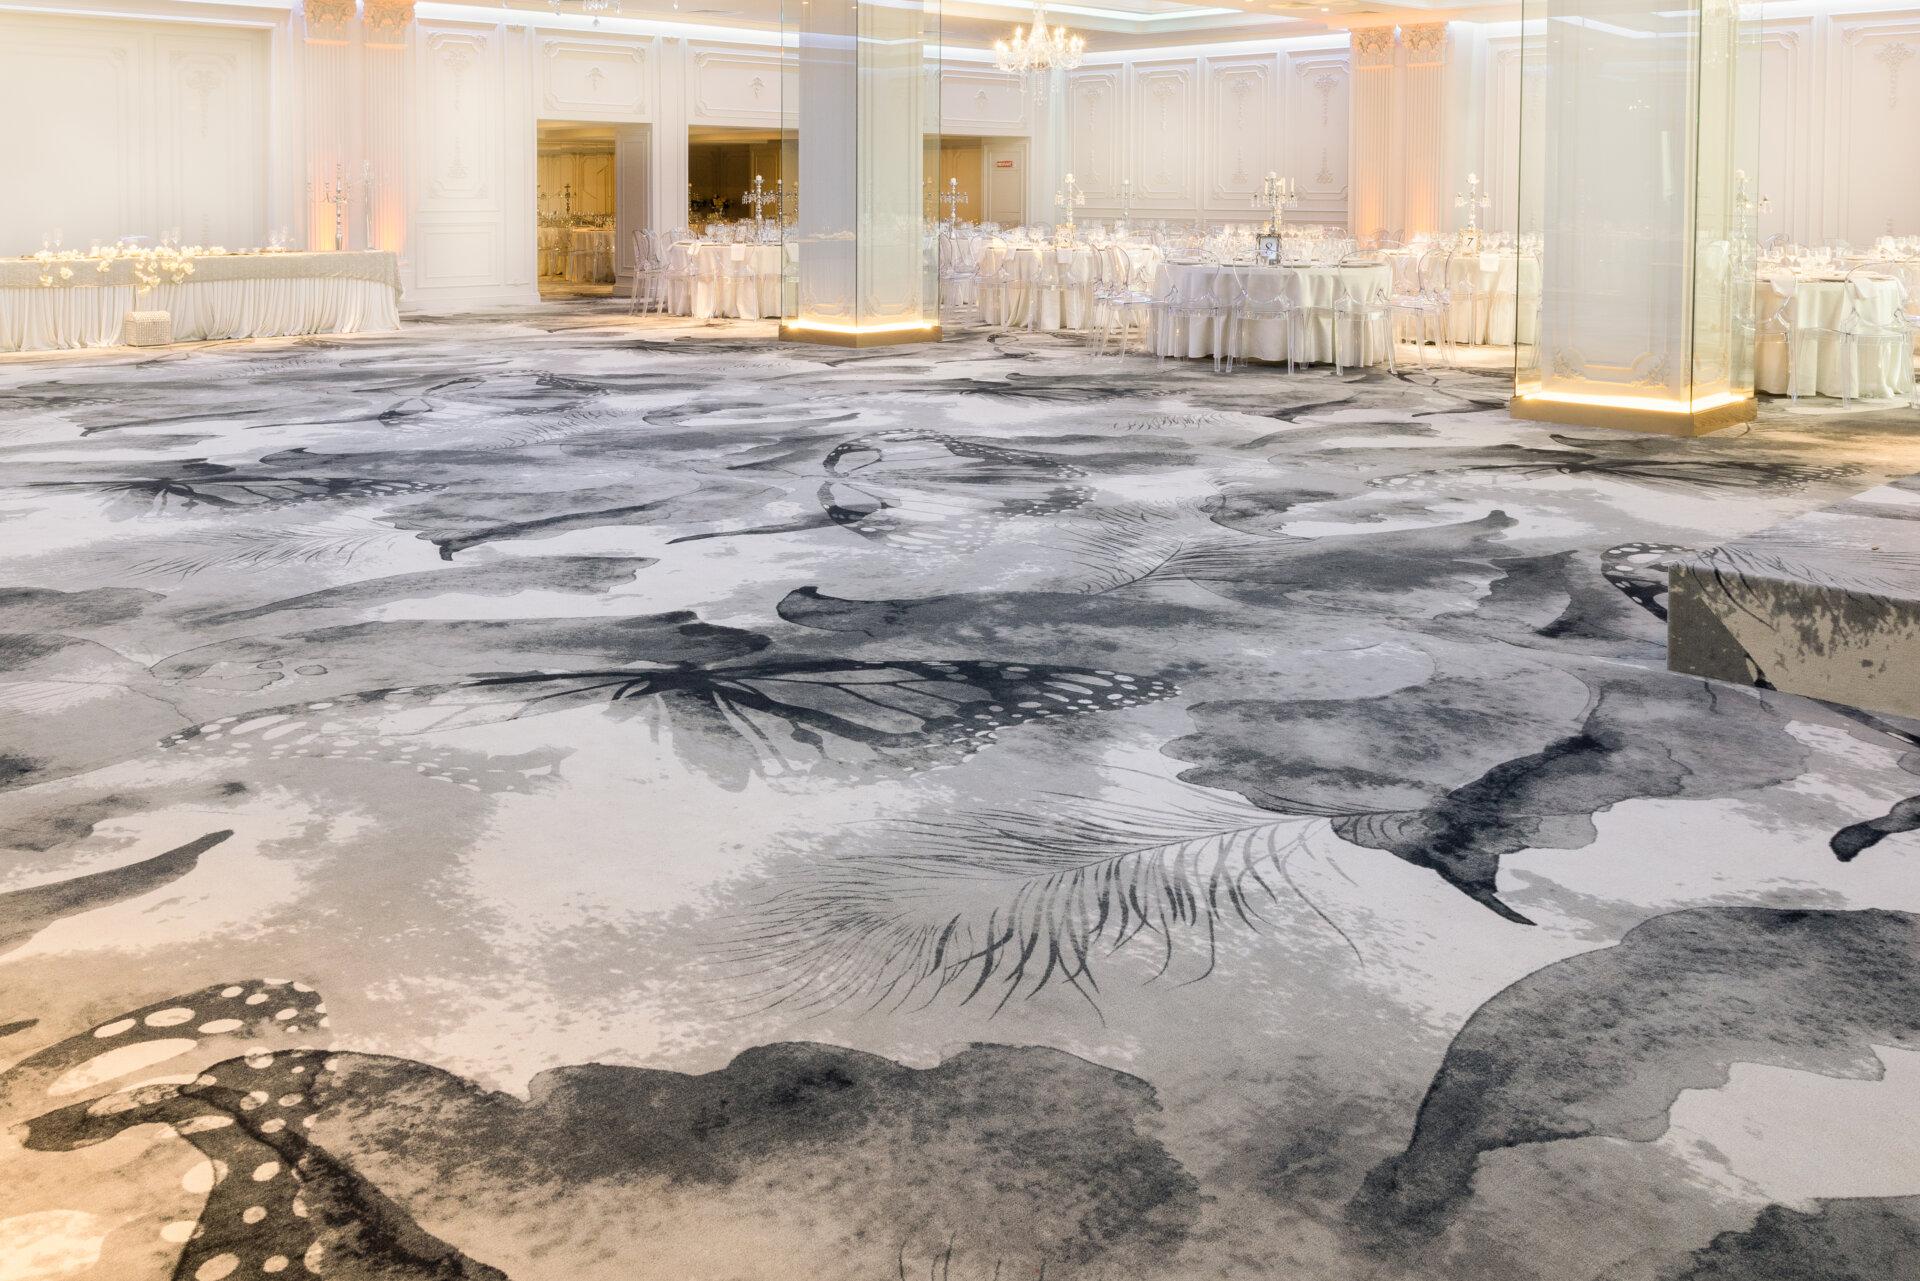 20210303-carpet&more-hotel-rocca-craiovaby-hugmedia-13